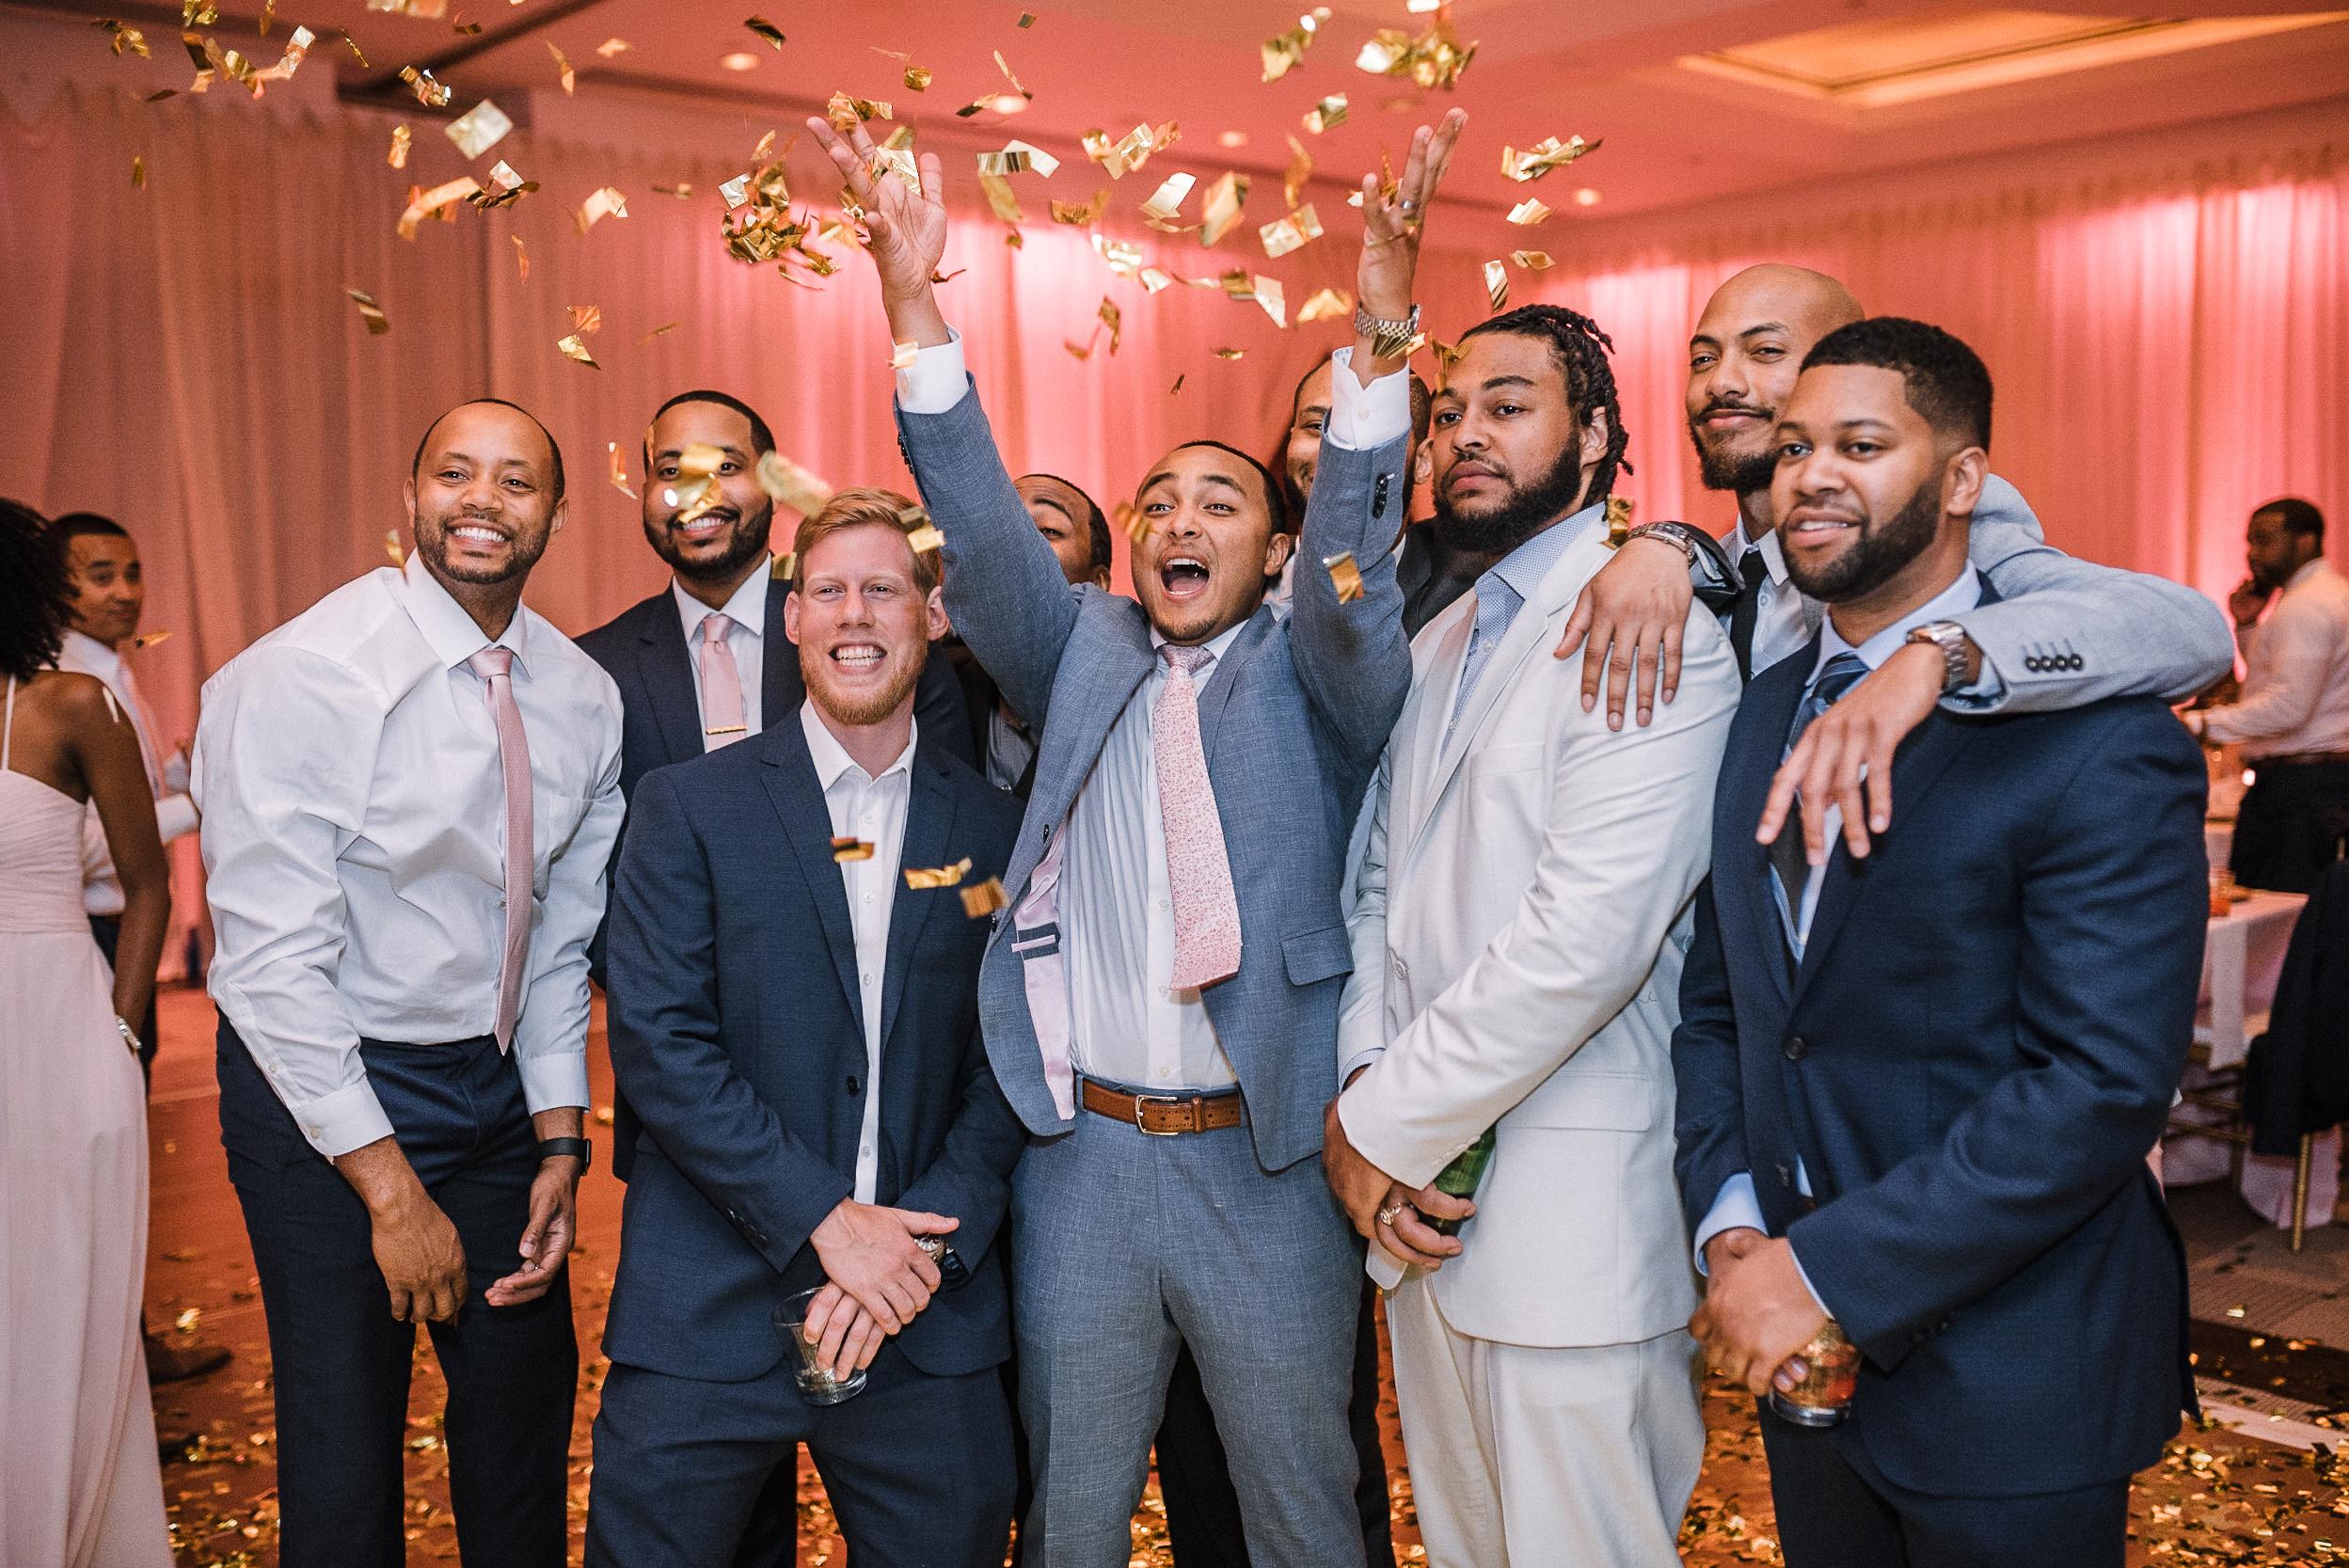 groom throwing confetti at The Park Hyatt Hotel in Washington DC